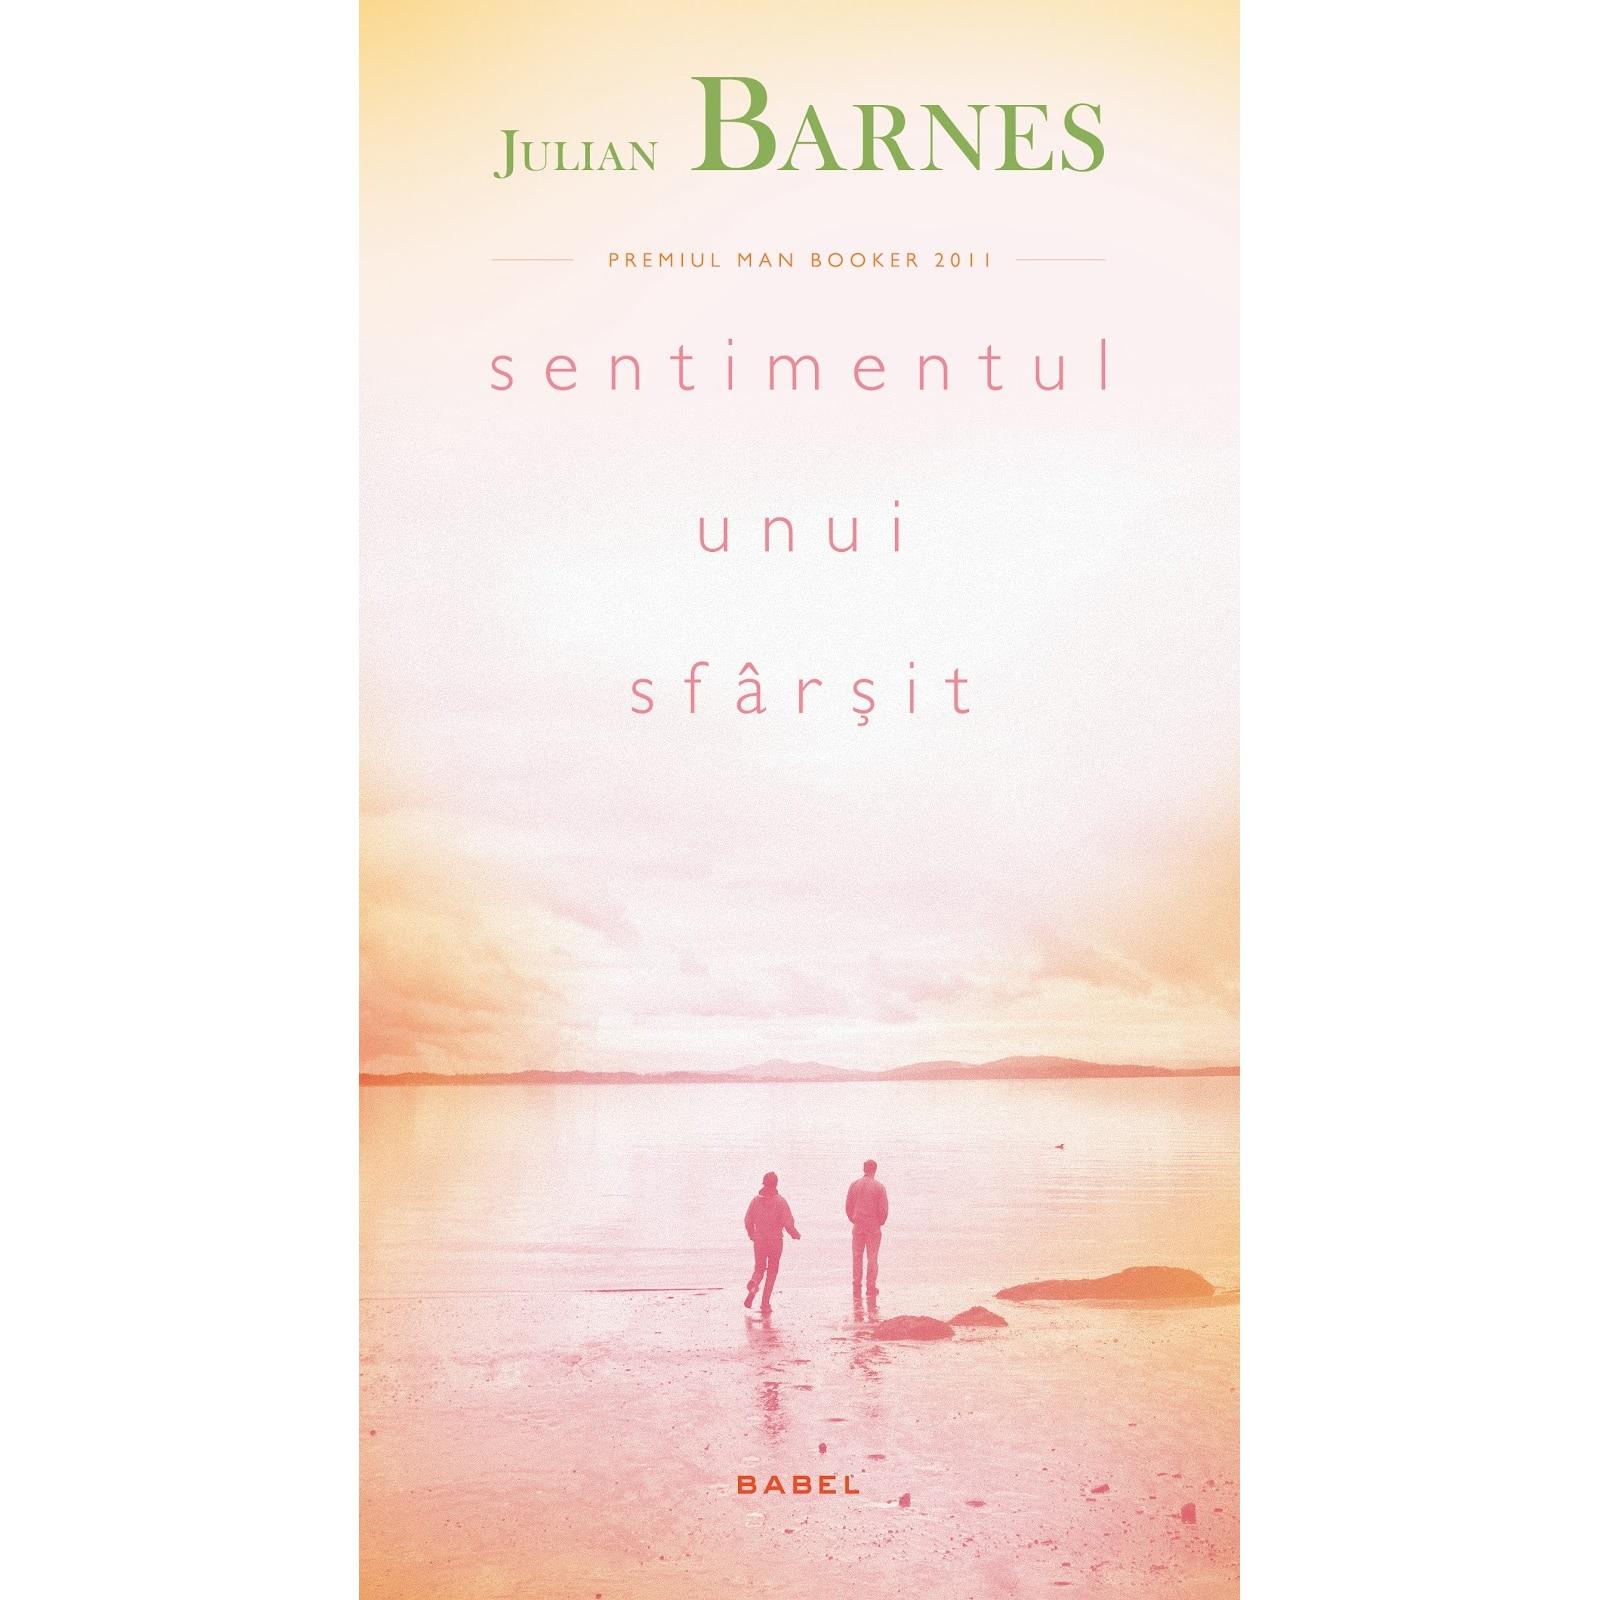 Sentimentul unui sfarsit - Julian Barnes - eMAG.ro